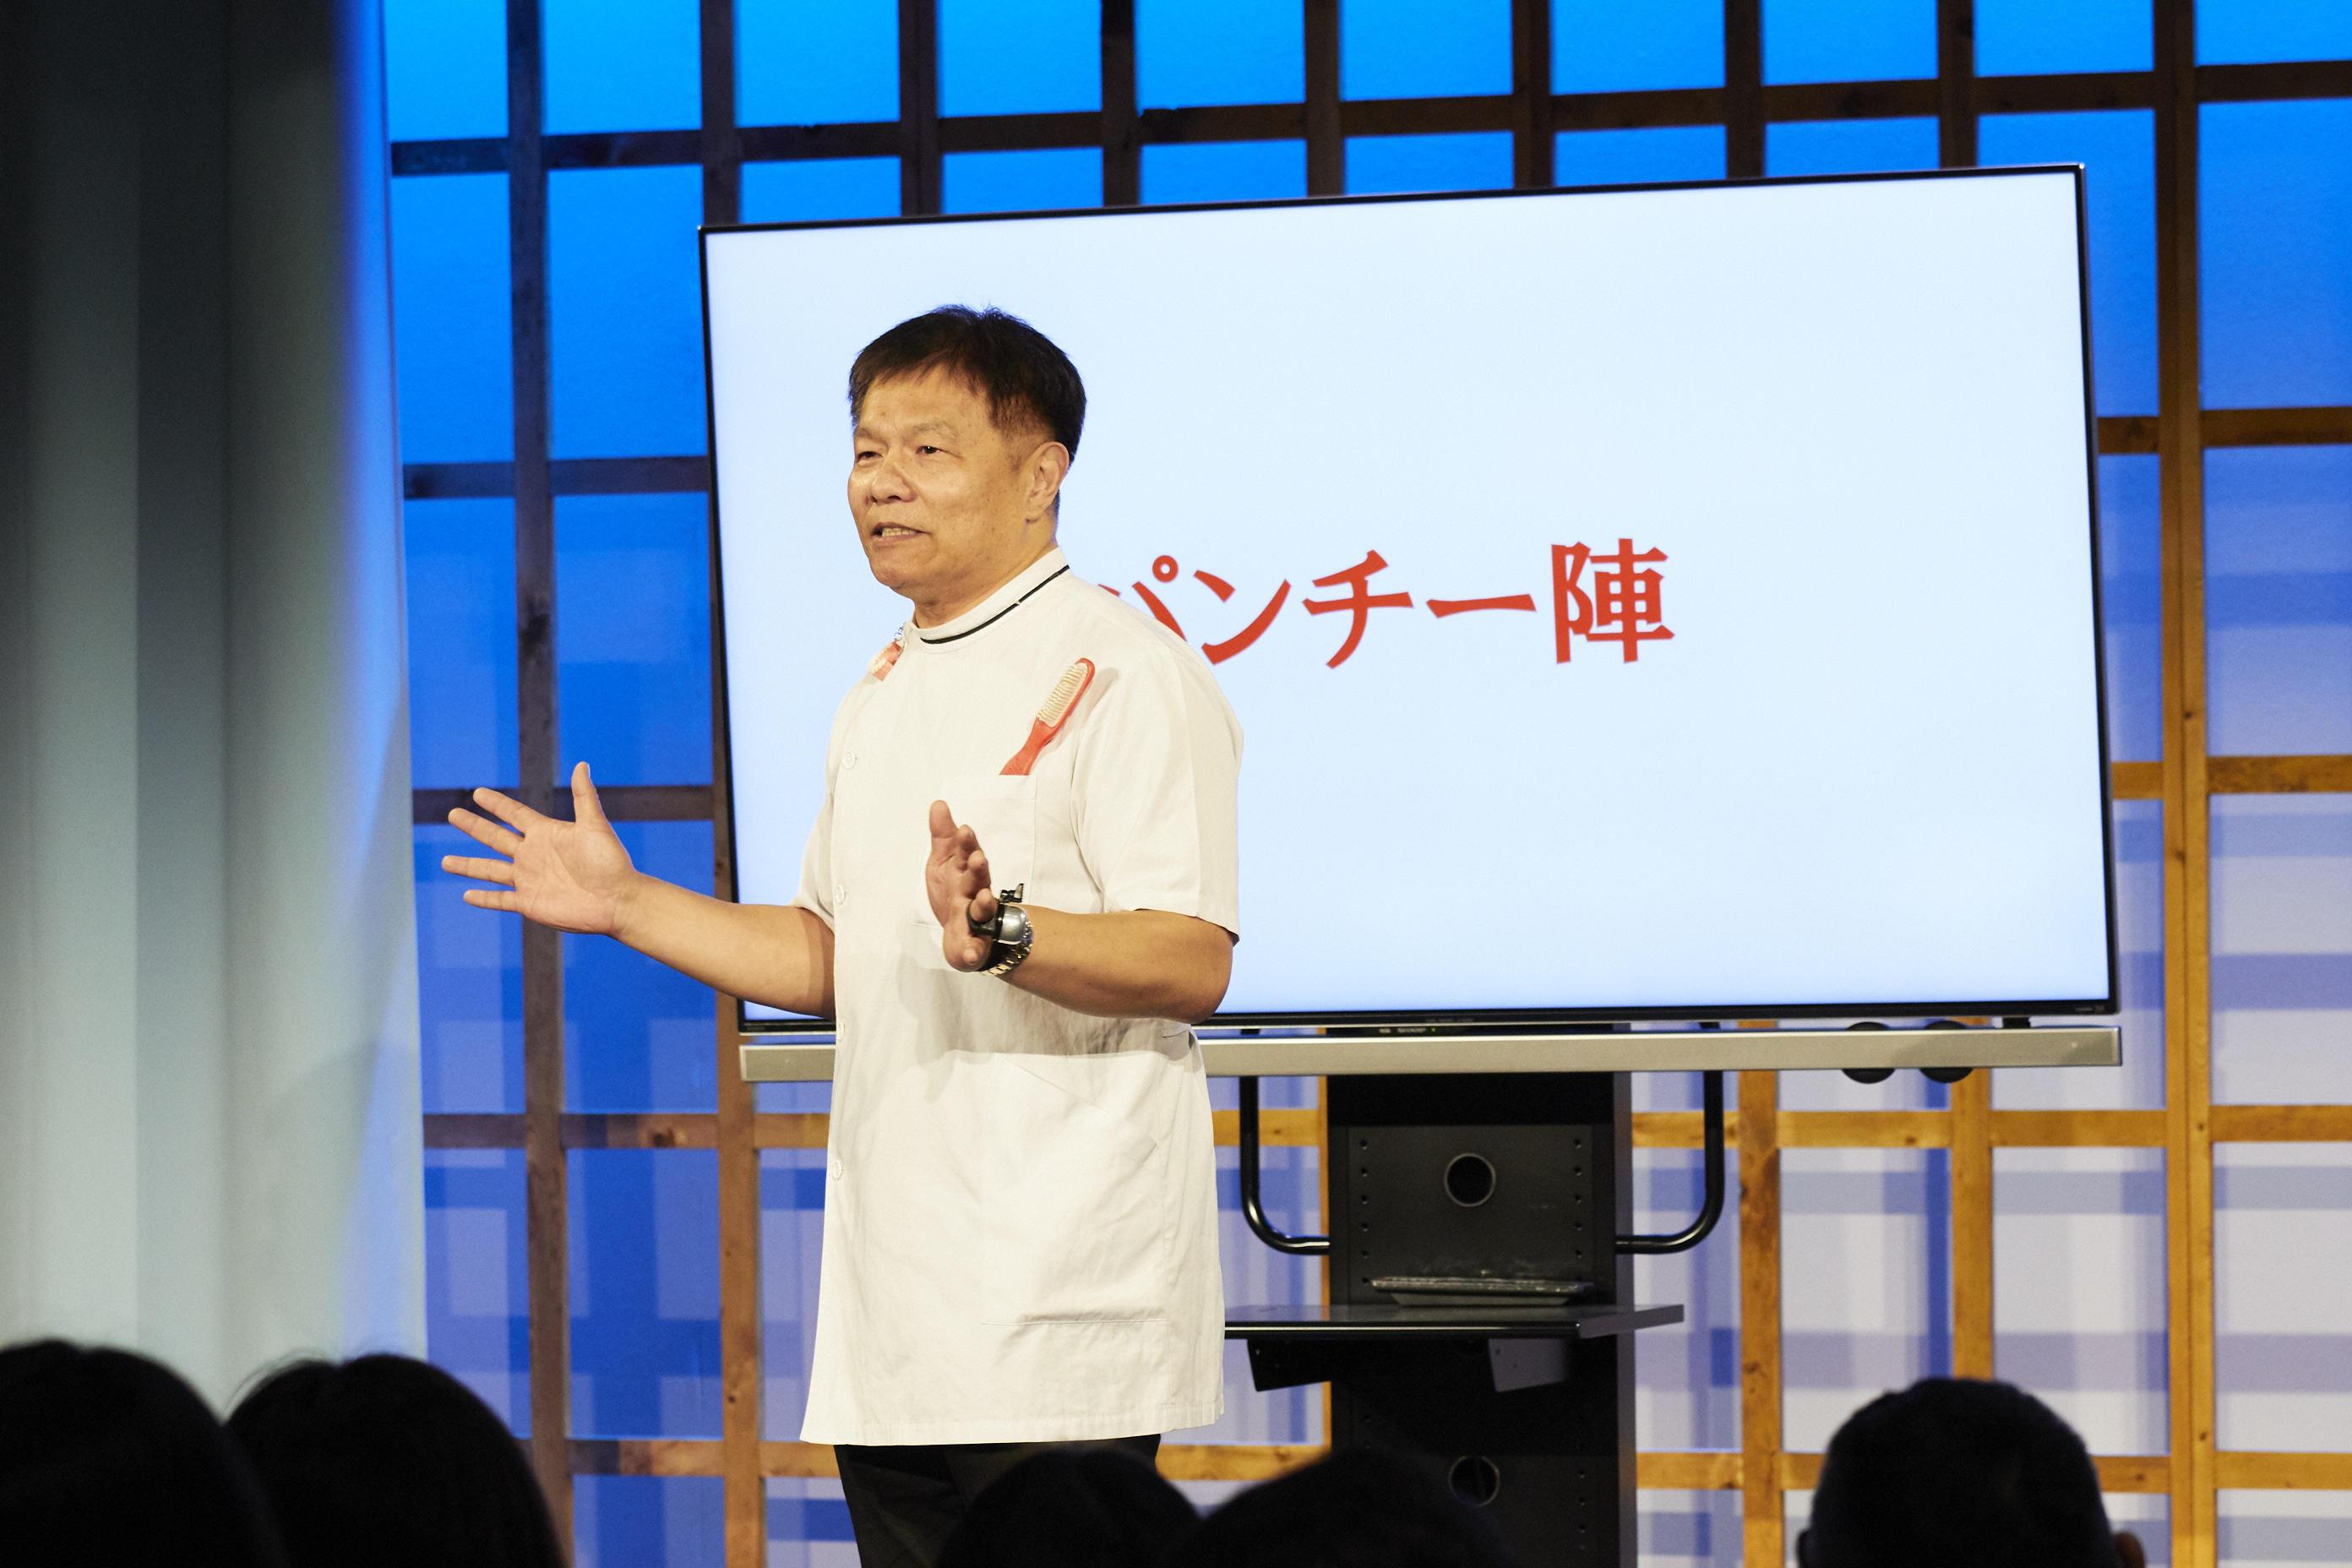 http://news.yoshimoto.co.jp/20180401100454-4b077aa6628bc775e65024886a84b6c34a5d6232.jpg